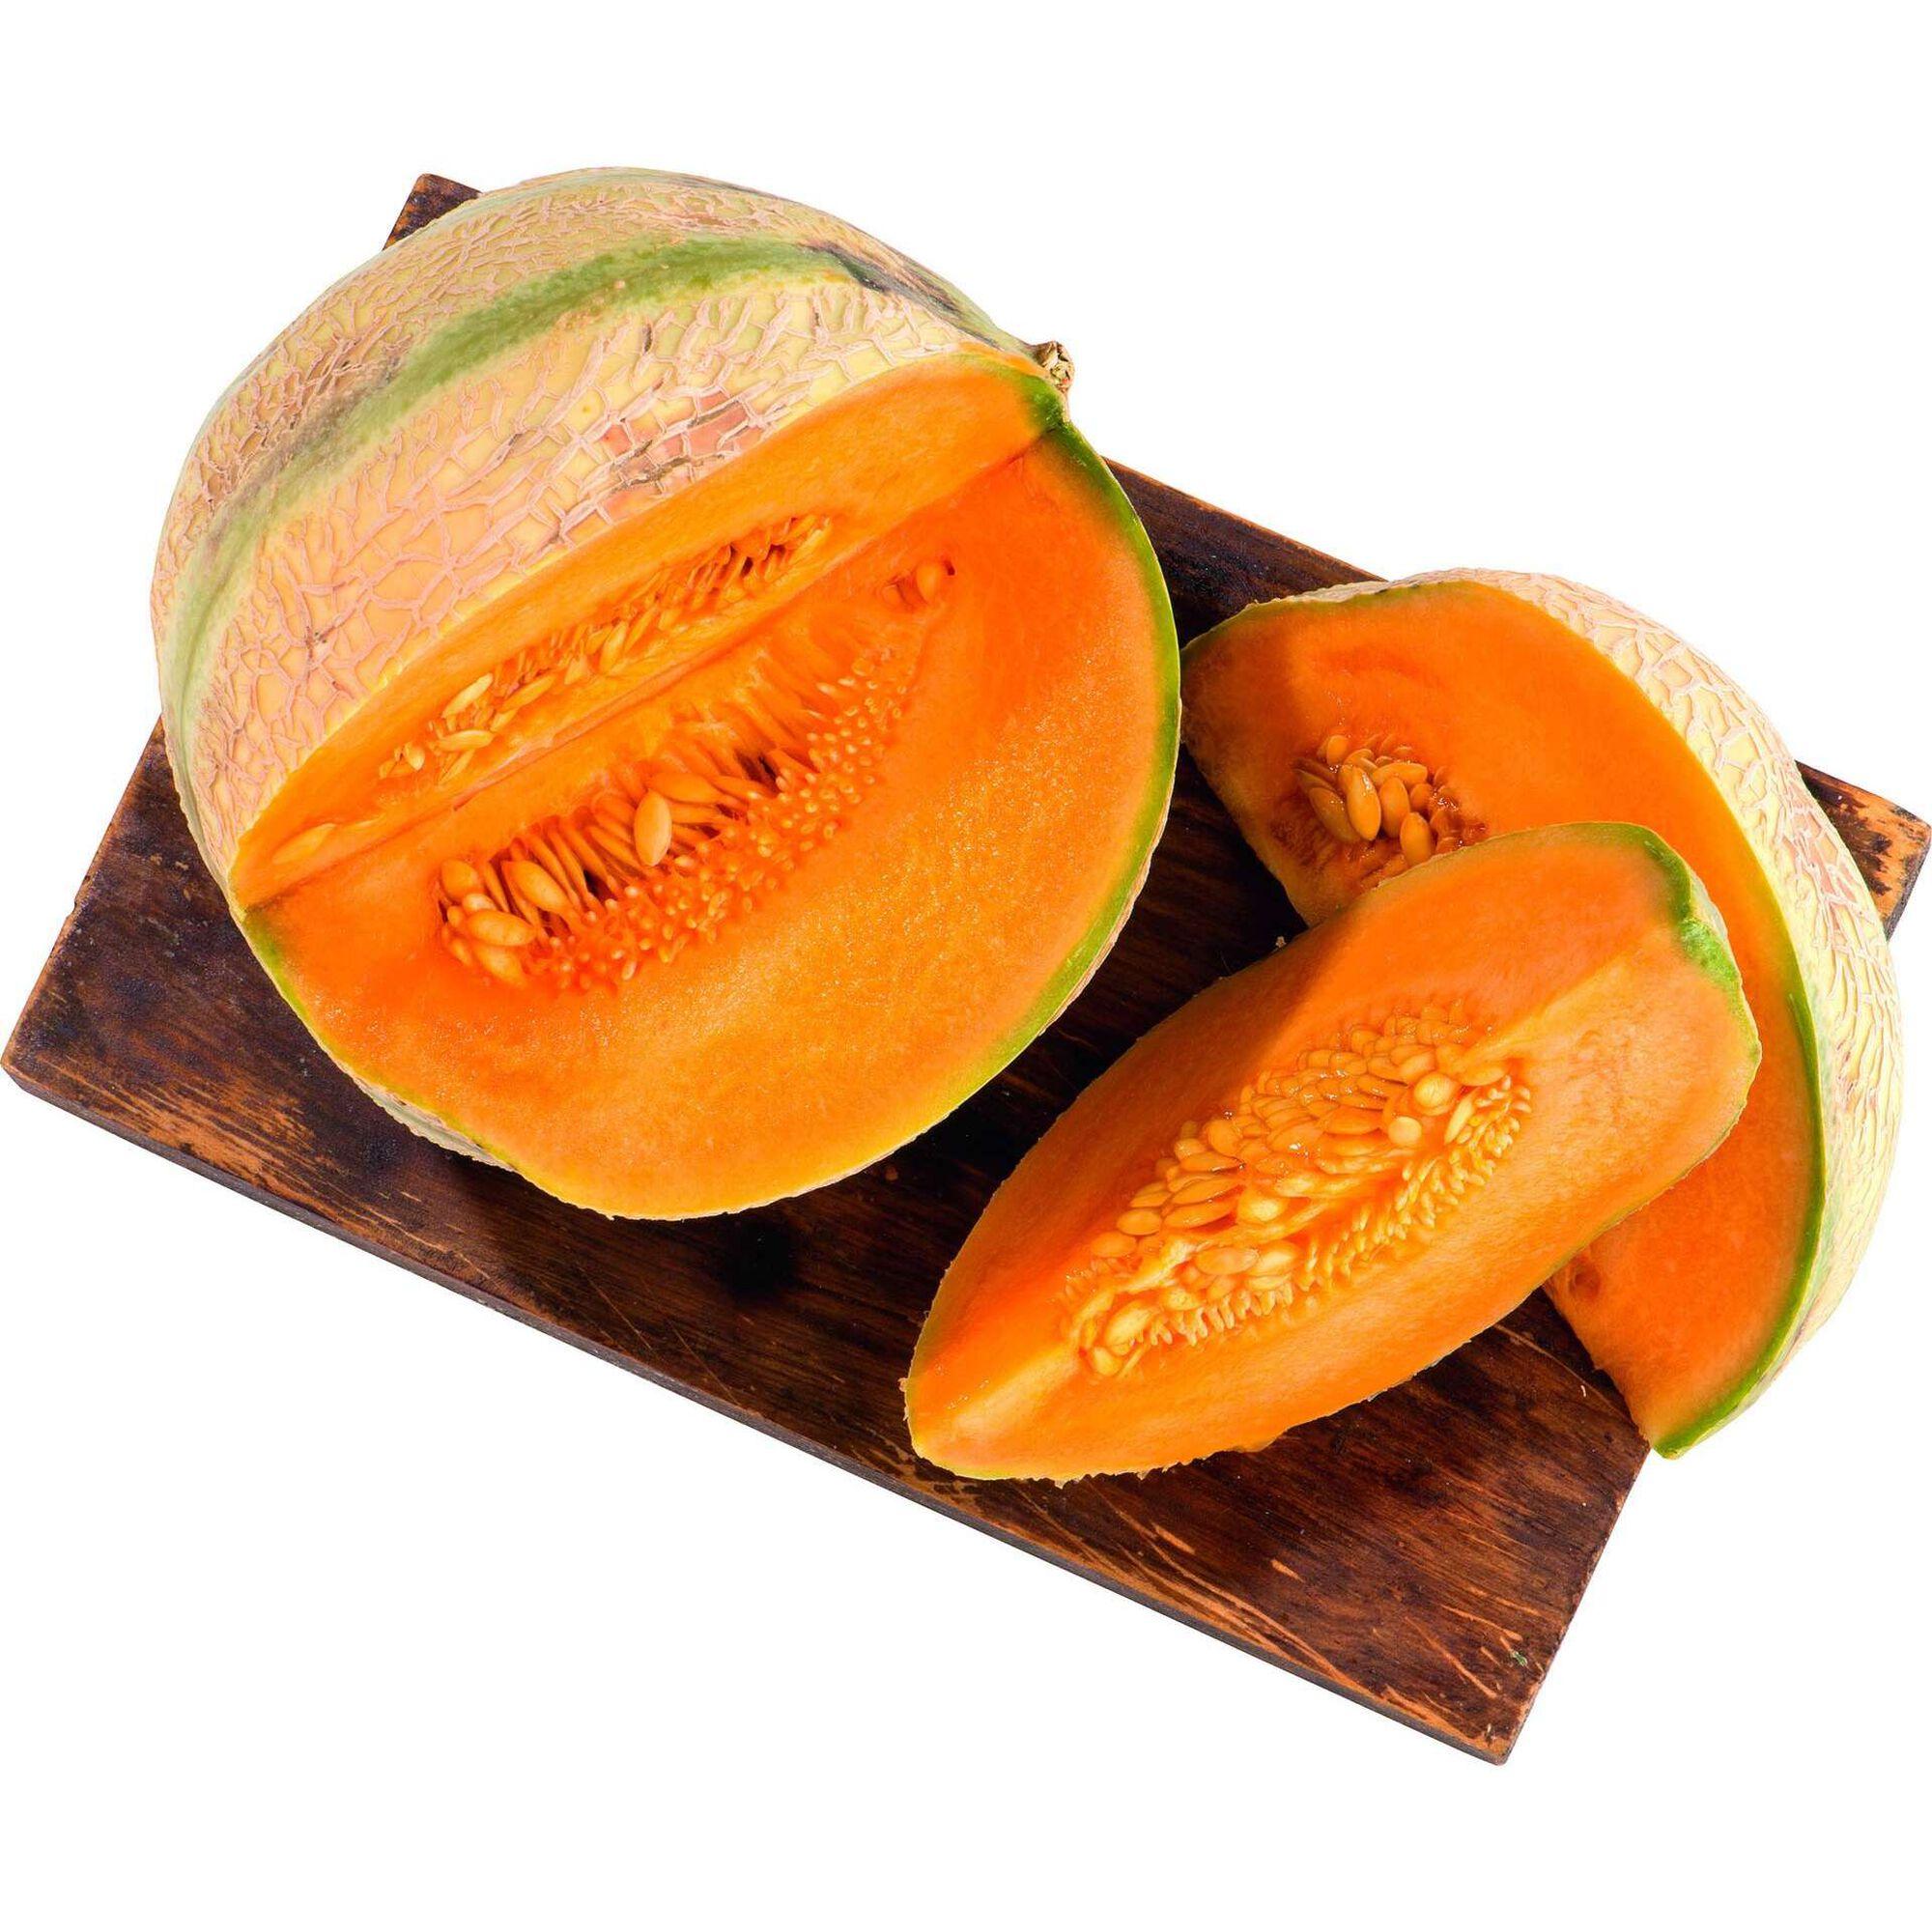 Meloa Cantalupe/Charentais Inteira